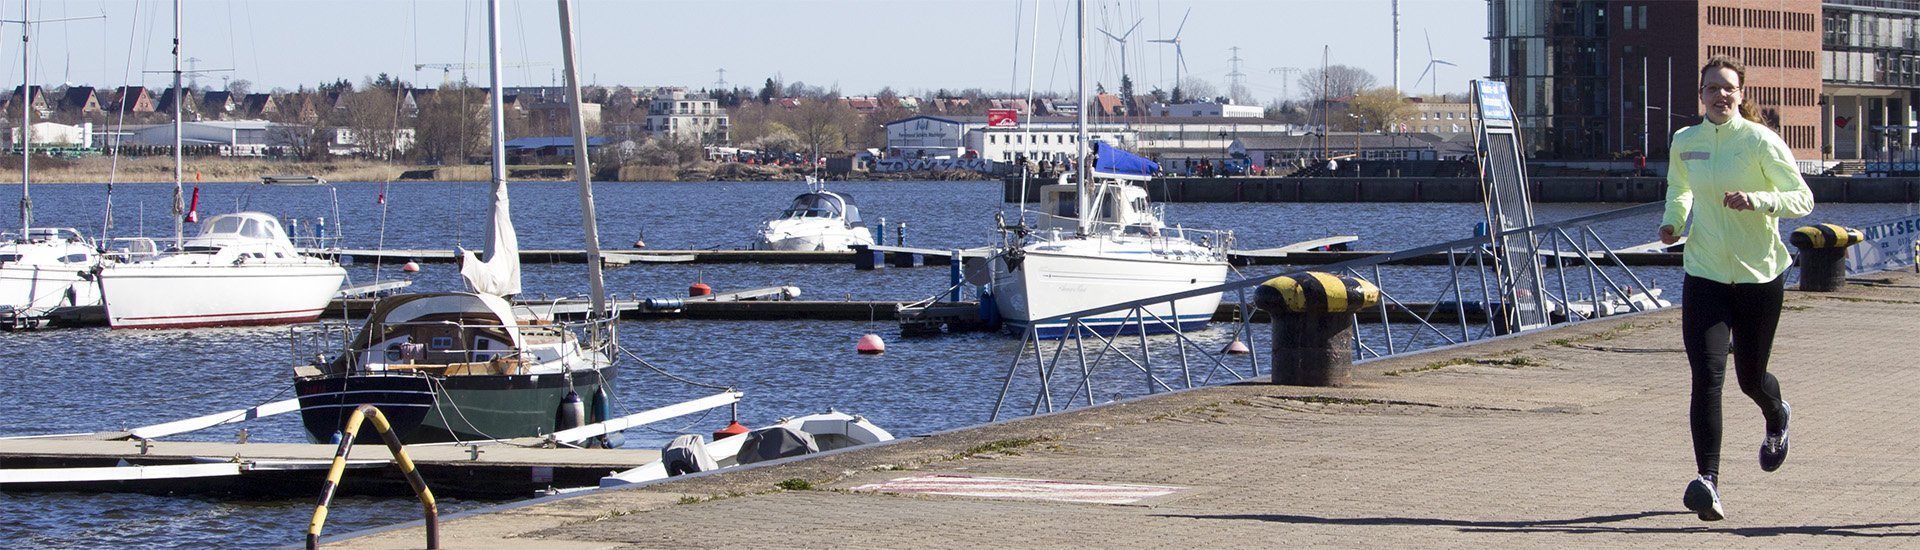 SightRunning Rostock - Juliane Leitert